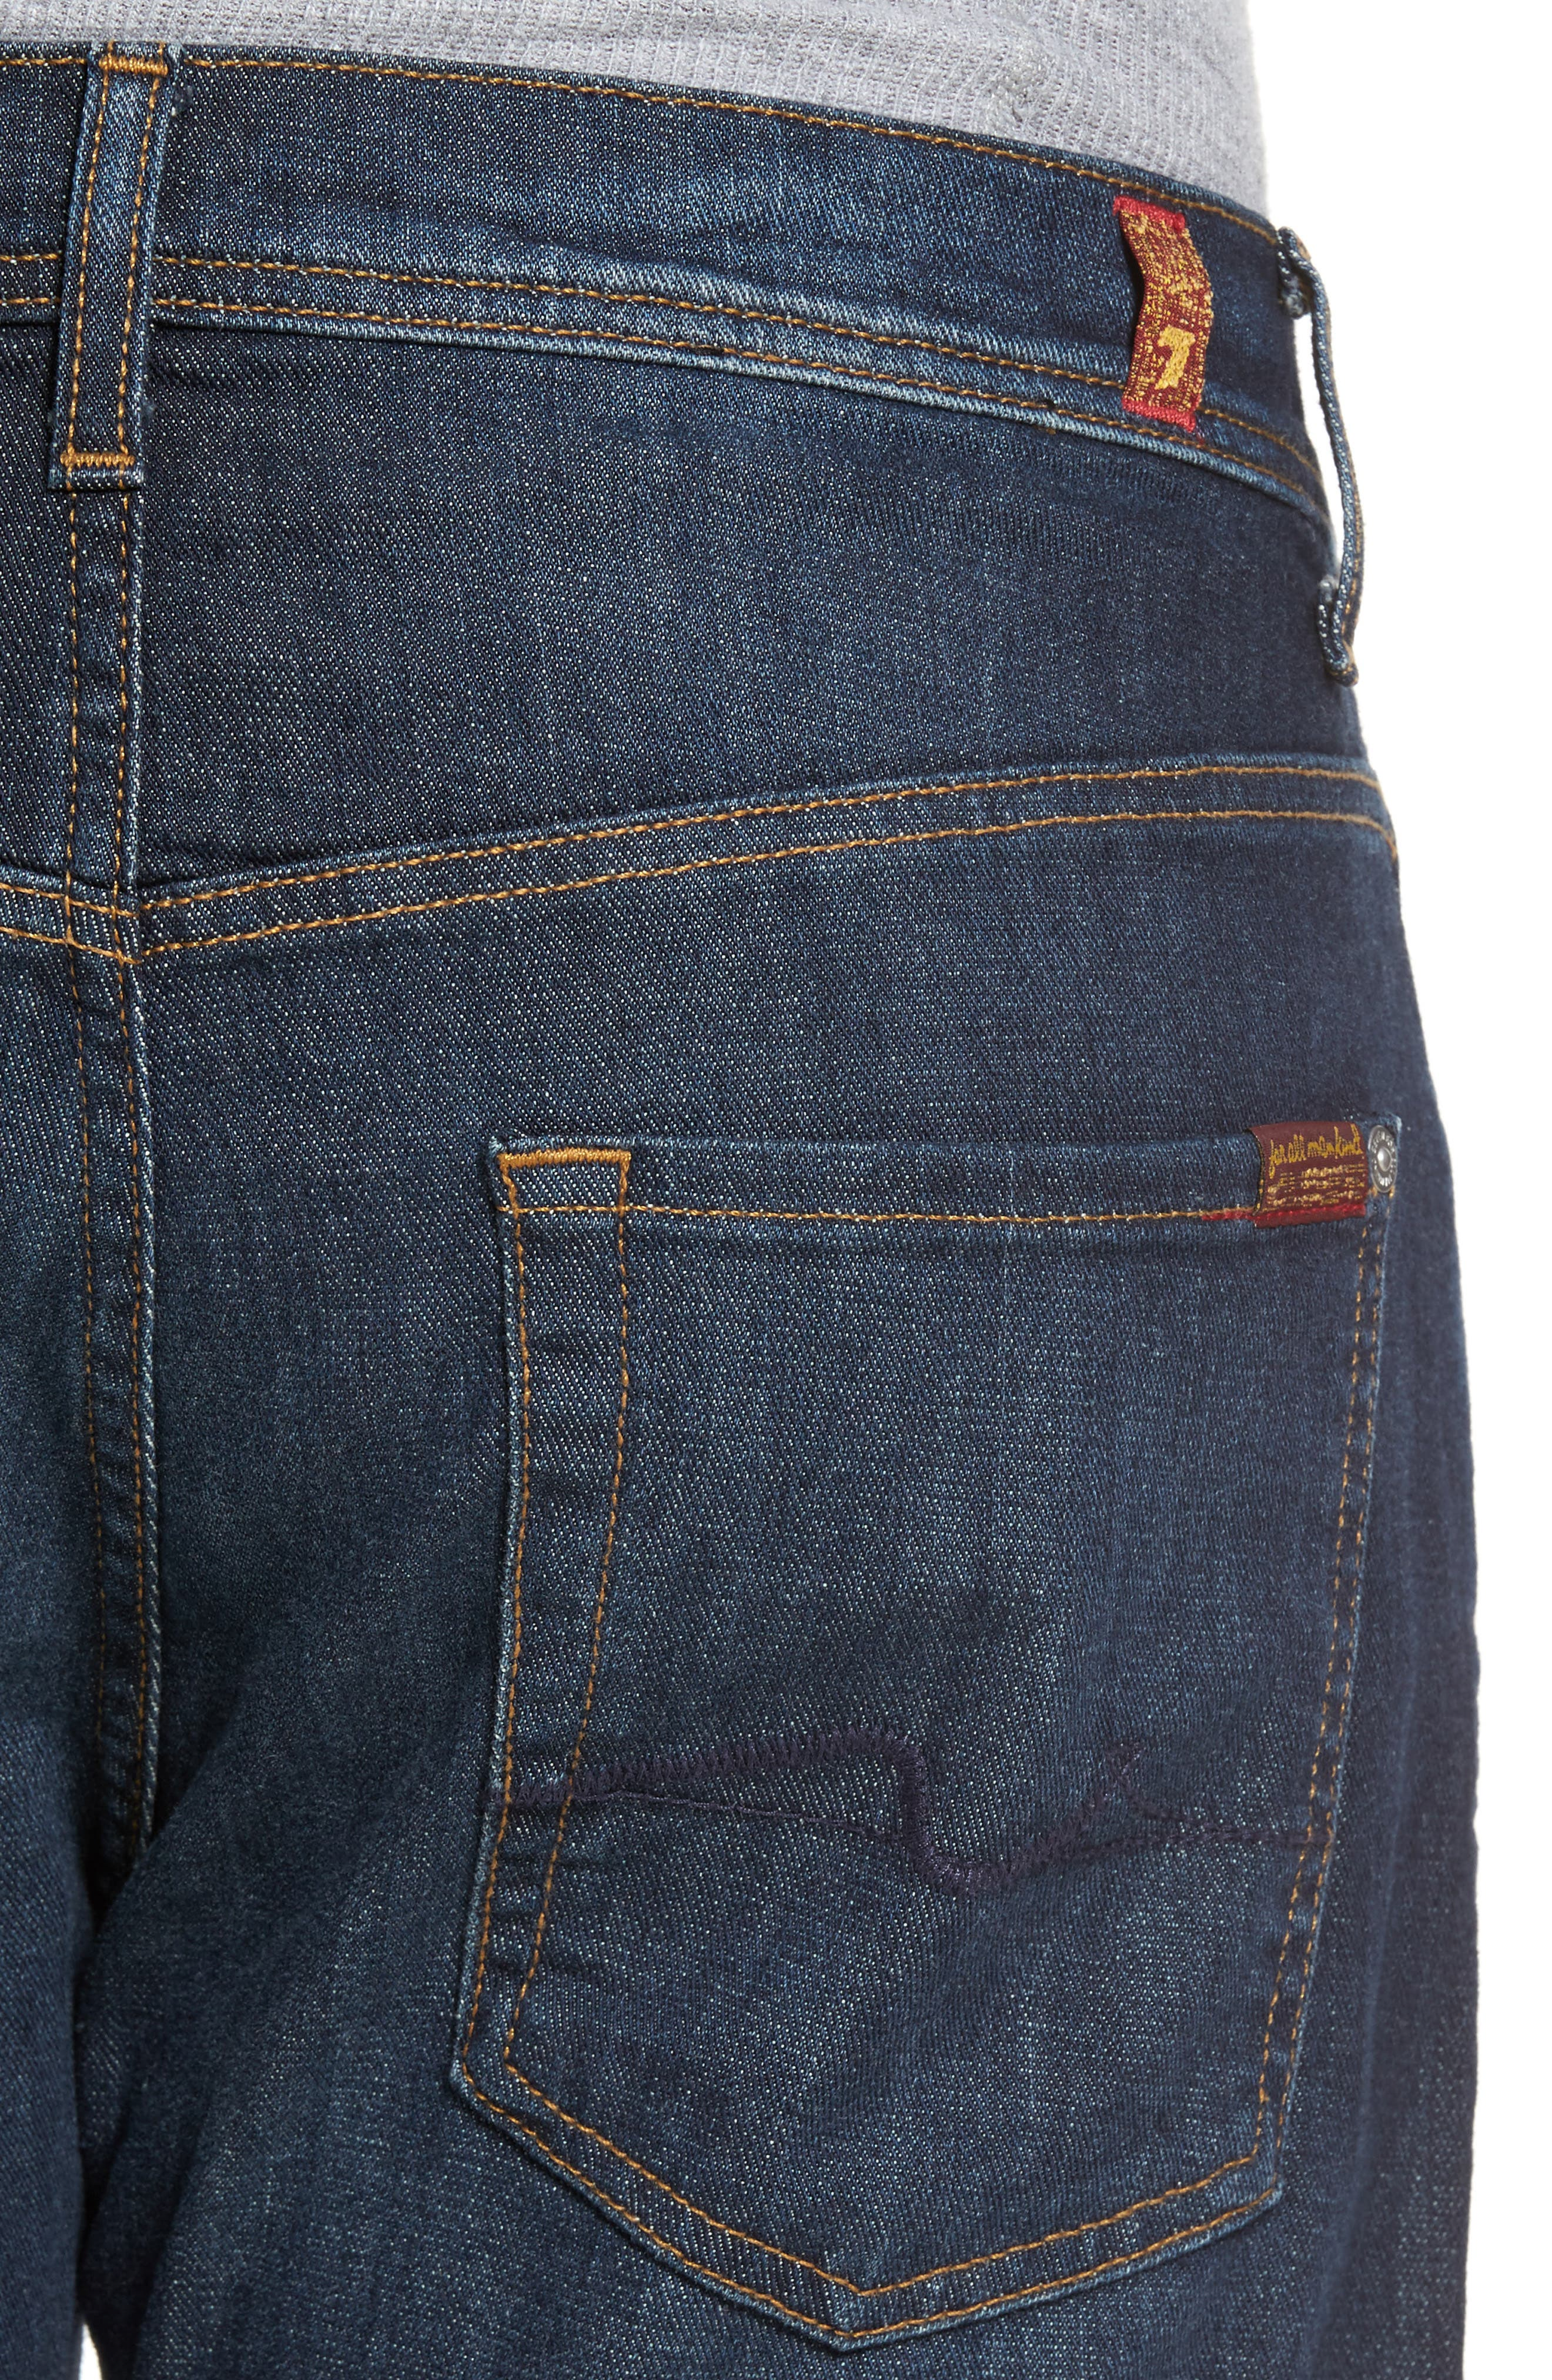 Brett Bootcut Jeans,                             Alternate thumbnail 4, color,                             402